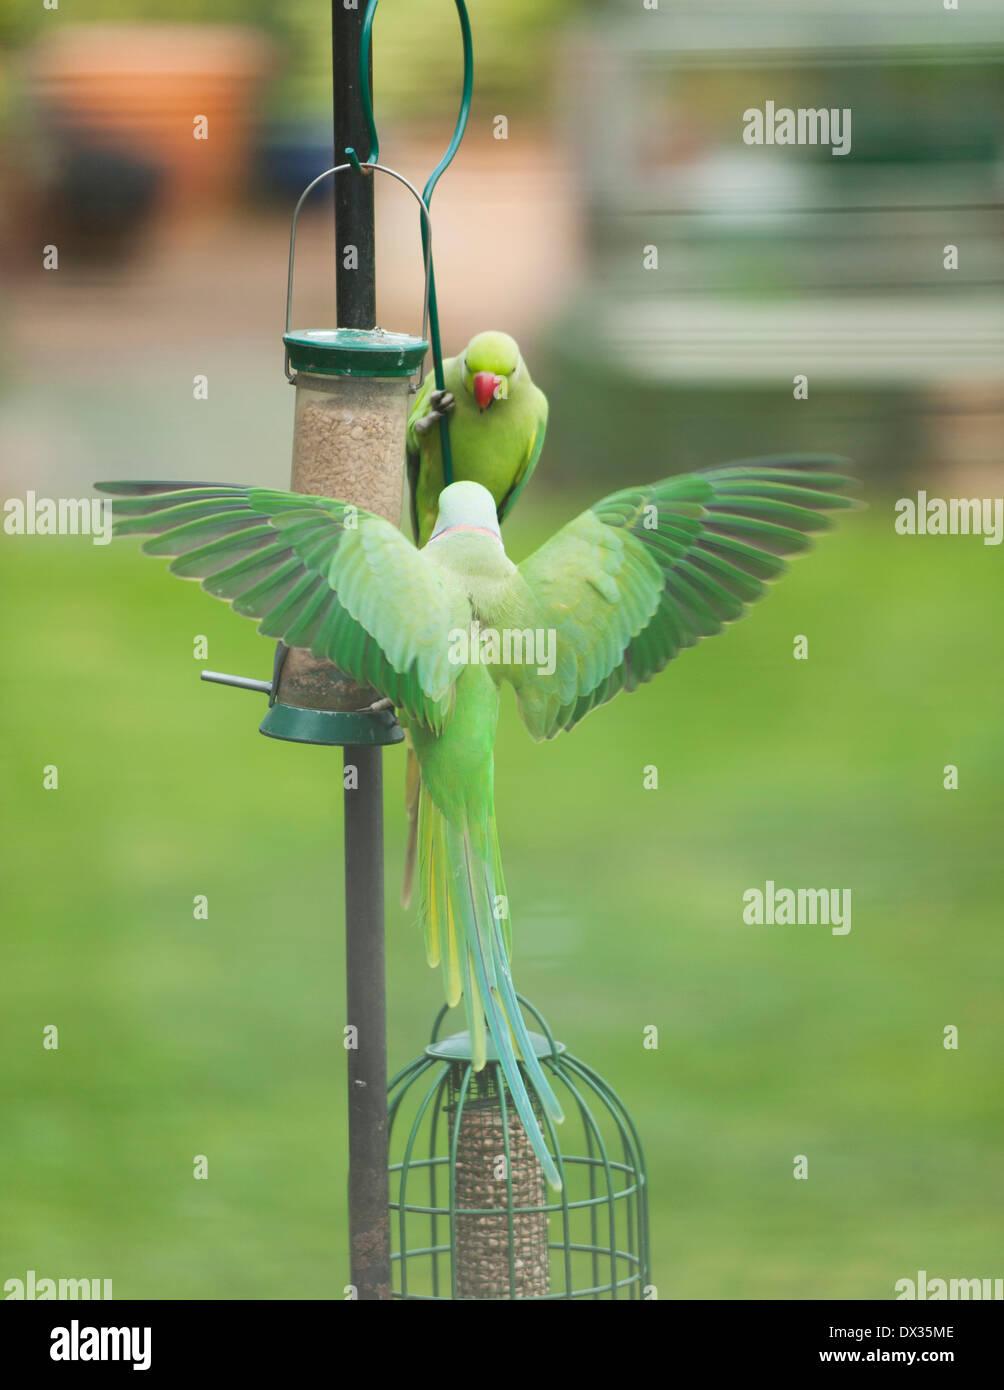 Wimbledon, SW London UK. 17th March, 2014. Ring-Necked Parakeets descend on a garden bird feeder on a warm spring Stock Photo